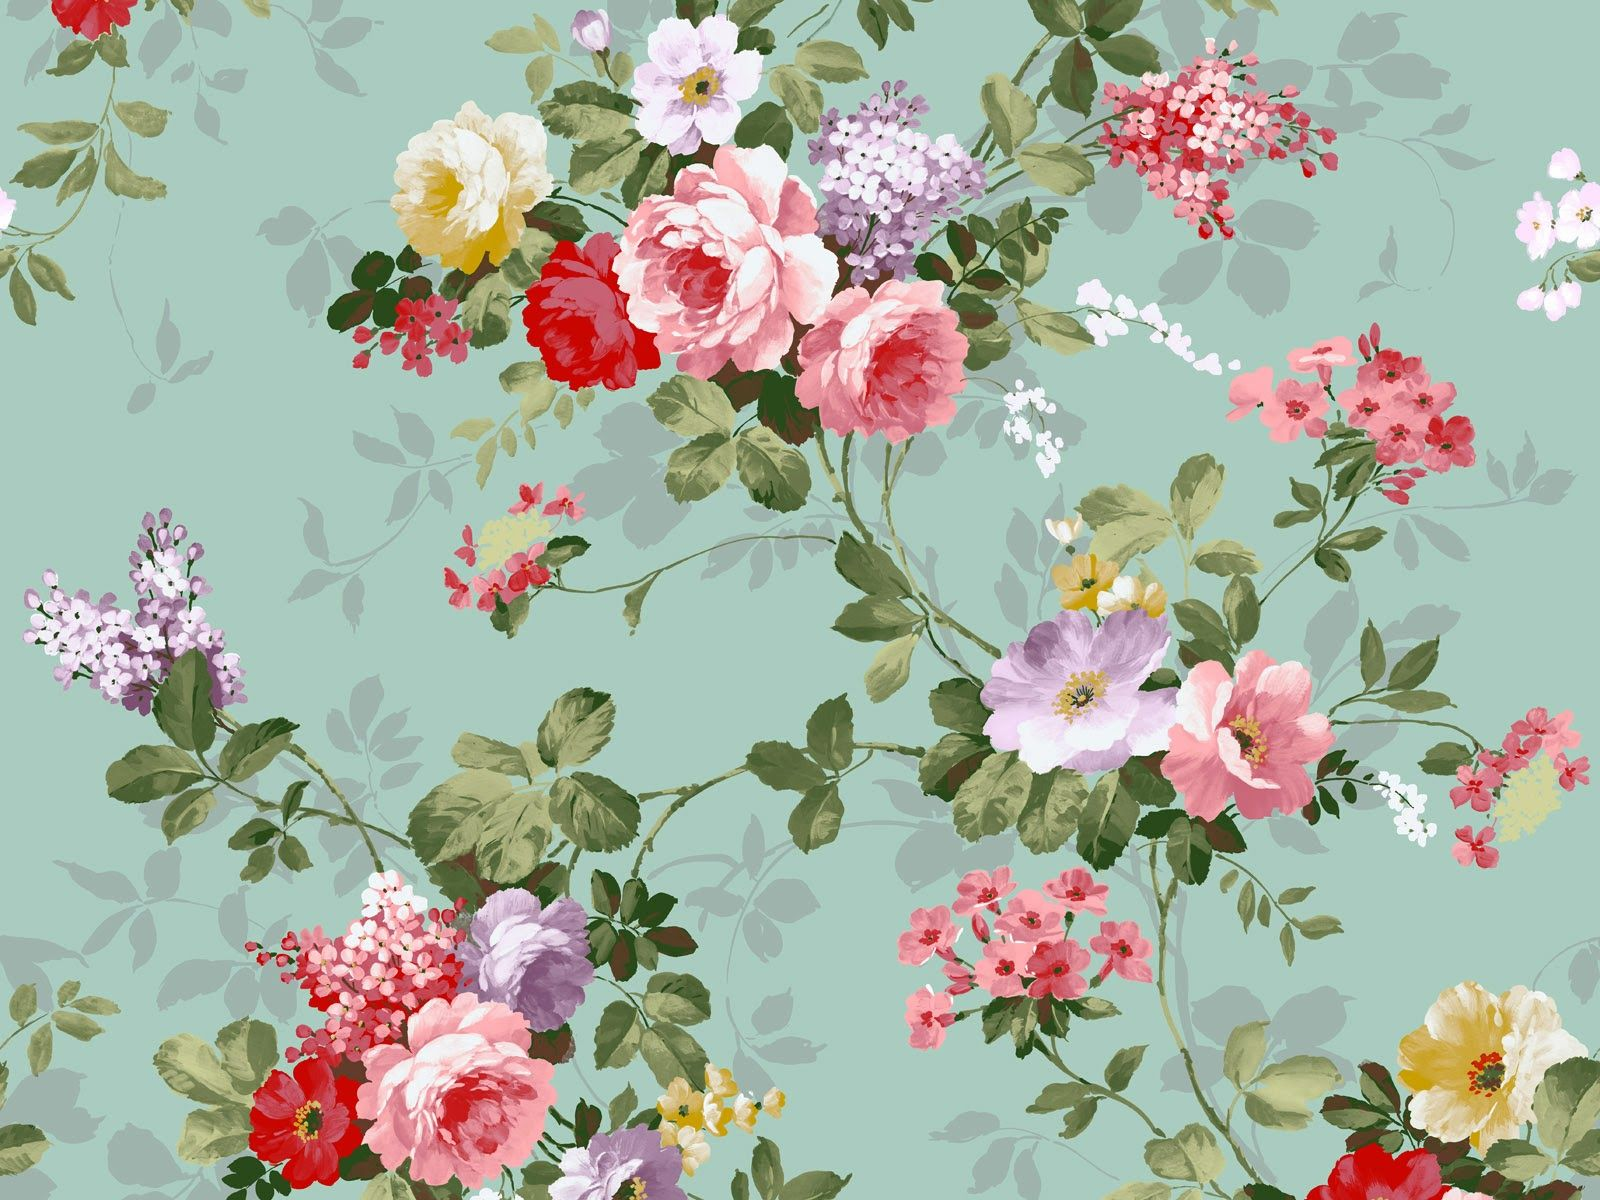 Vintage Flower Wallpaper Vintage Flowers Wallpaper Vintage Floral Backgrounds Vintage Floral Wallpapers